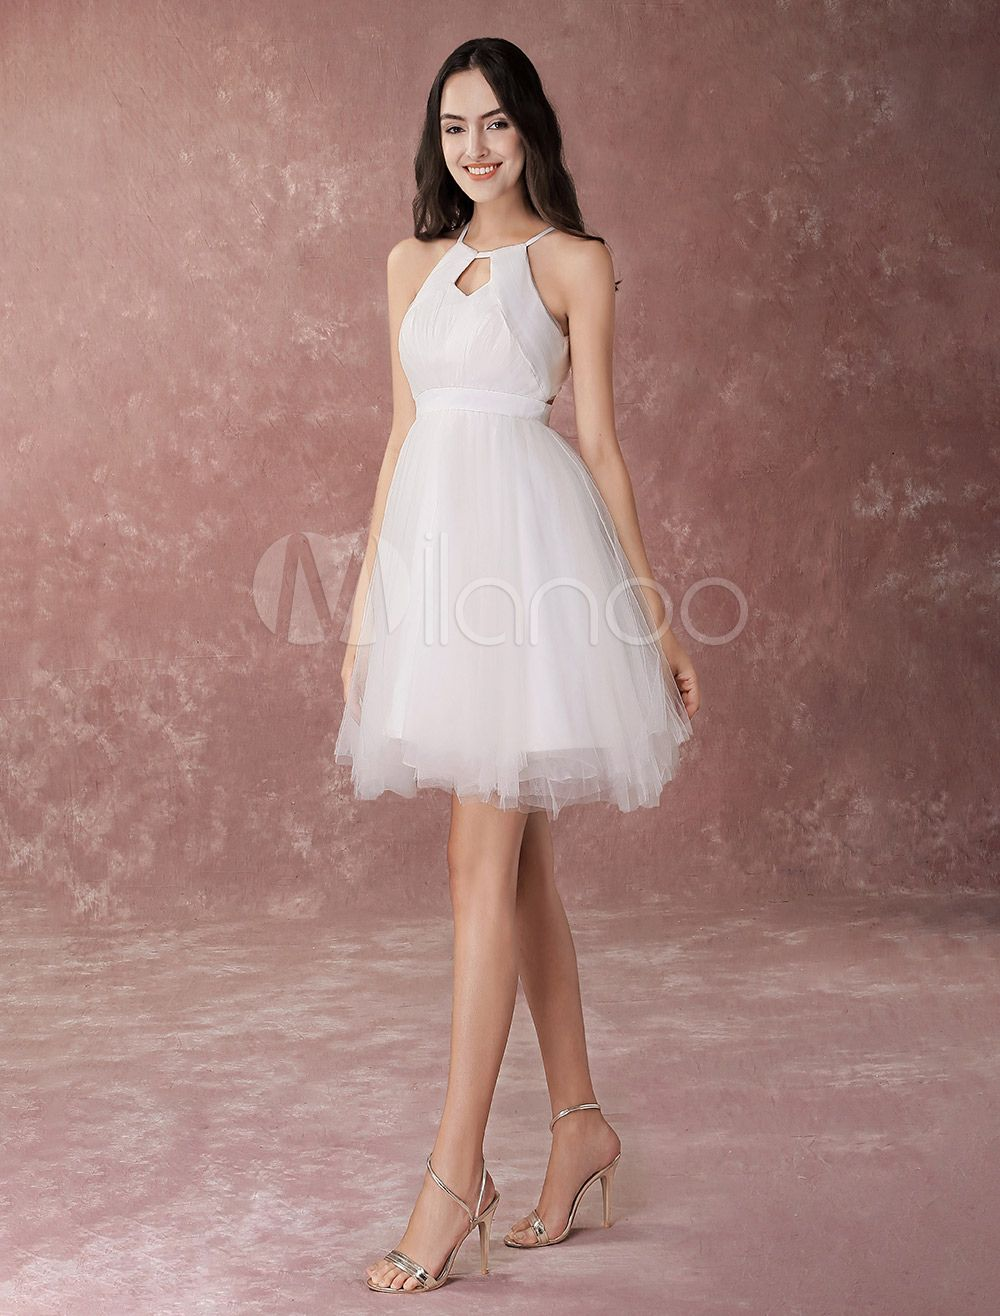 Short Wedding Dress Halter Little White Dress Tulle A Line Cute Homecoming Dress White Bridal Dresses Short White Dress Wedding White Lace Wedding Dress [ 1316 x 1000 Pixel ]